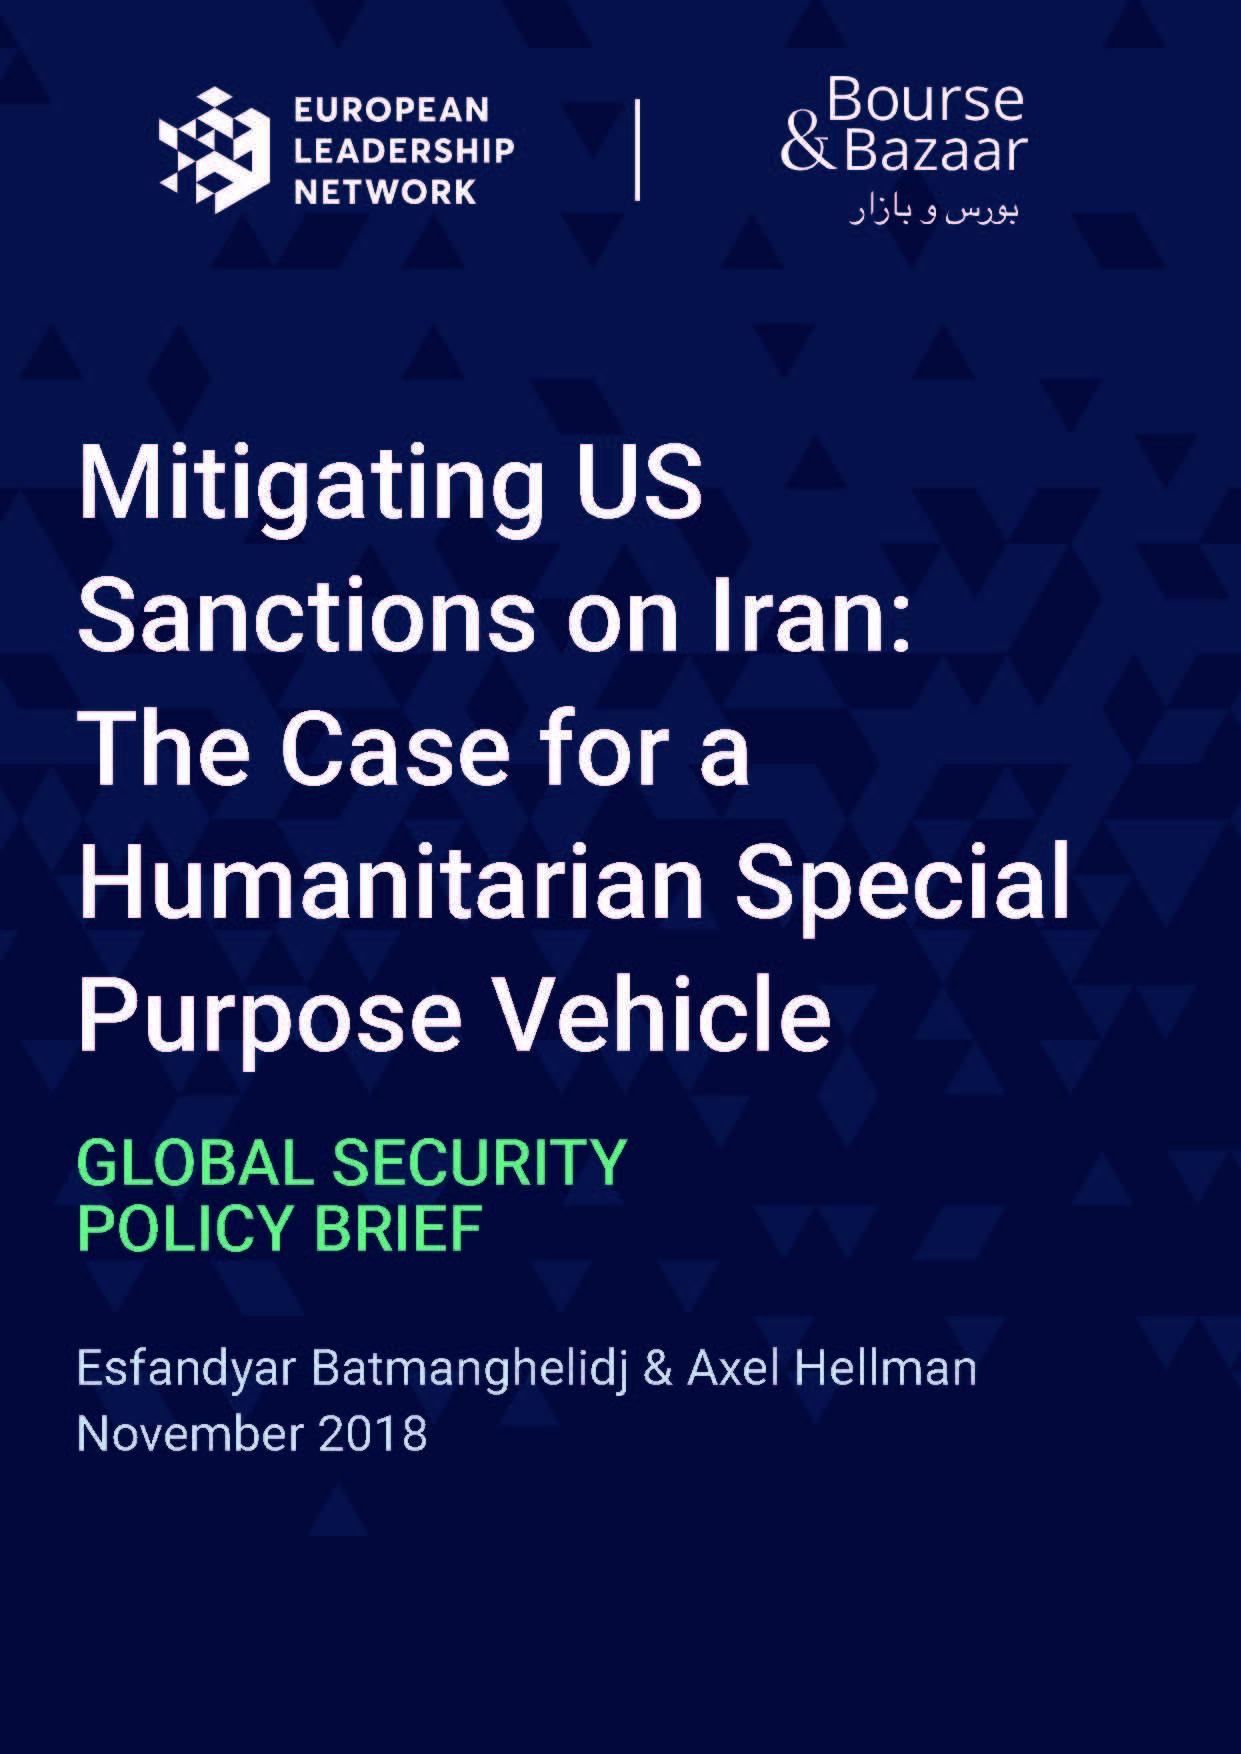 B&B_ELB_HSPV_Iran_Policy_Brief_RS_Page_01.jpg